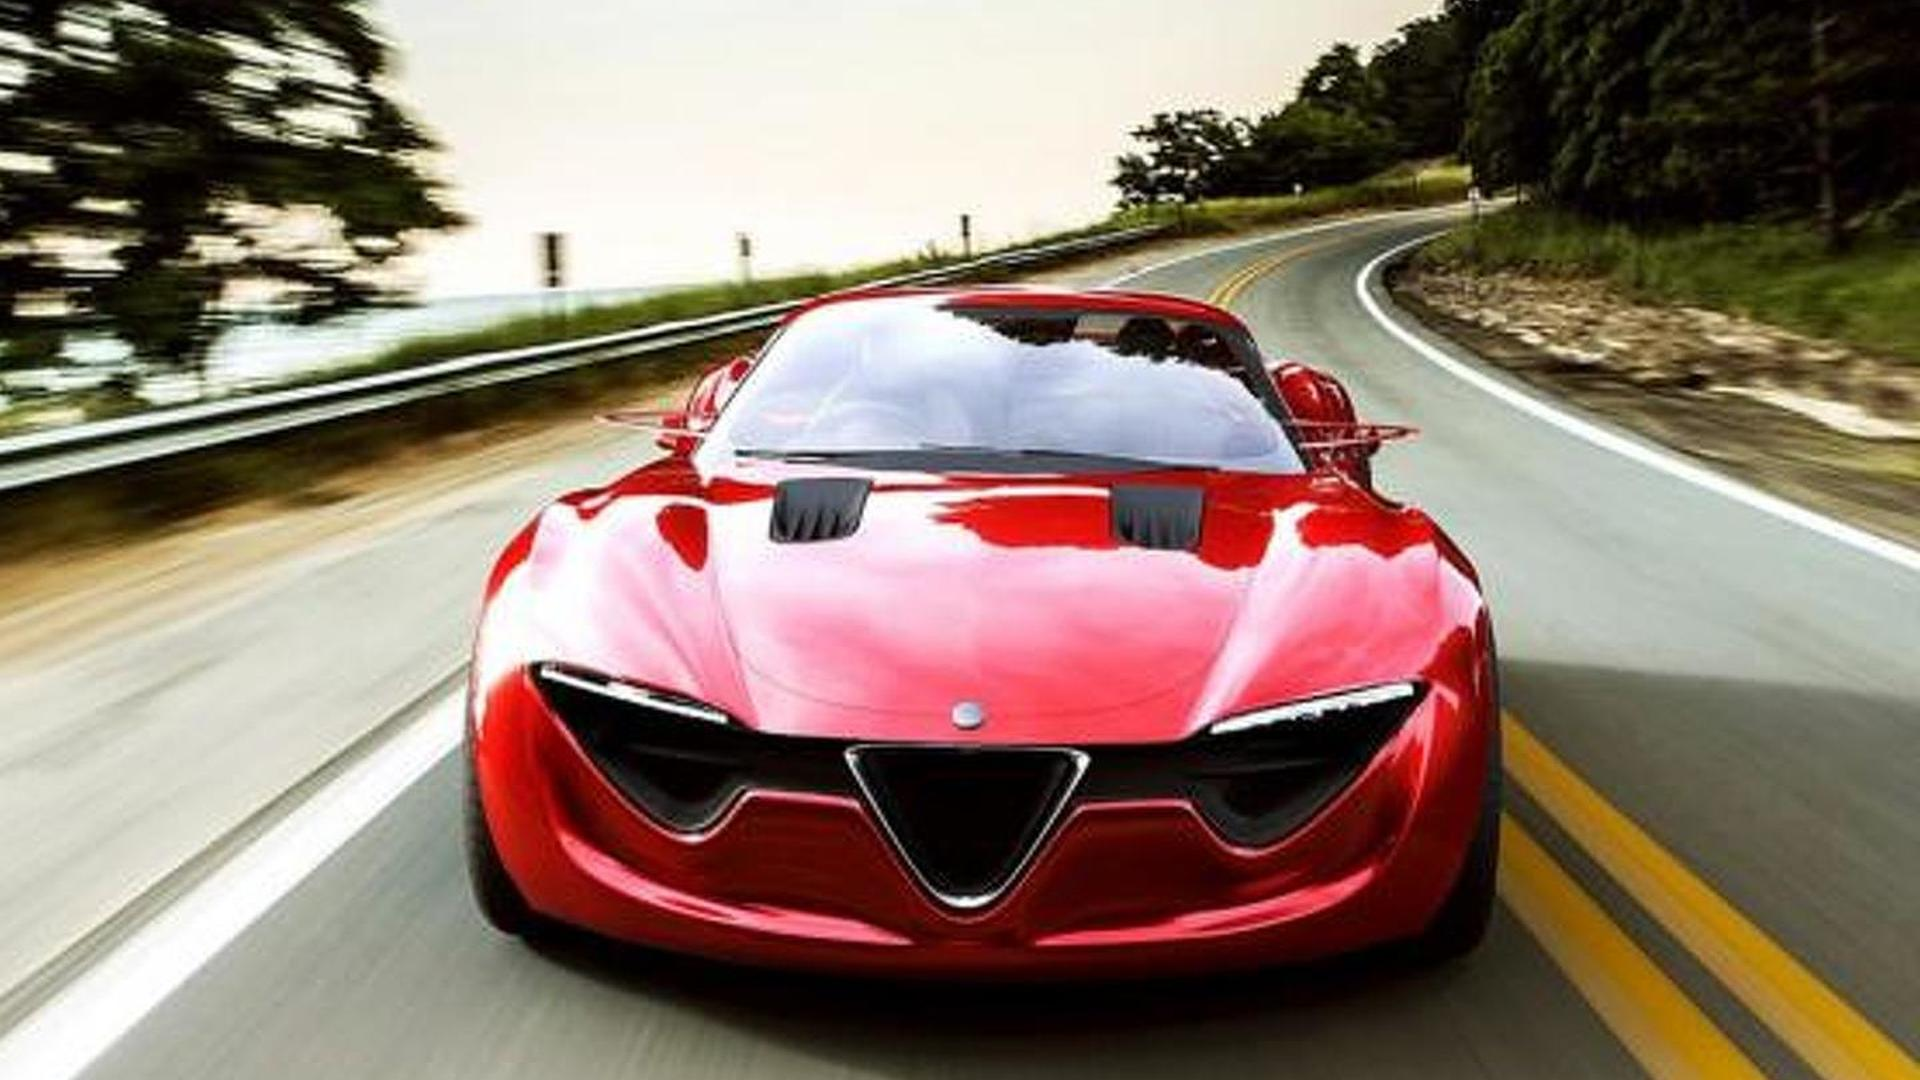 Alfa Romeo future lineup to include rear-wheel drive sedans & coupes - report